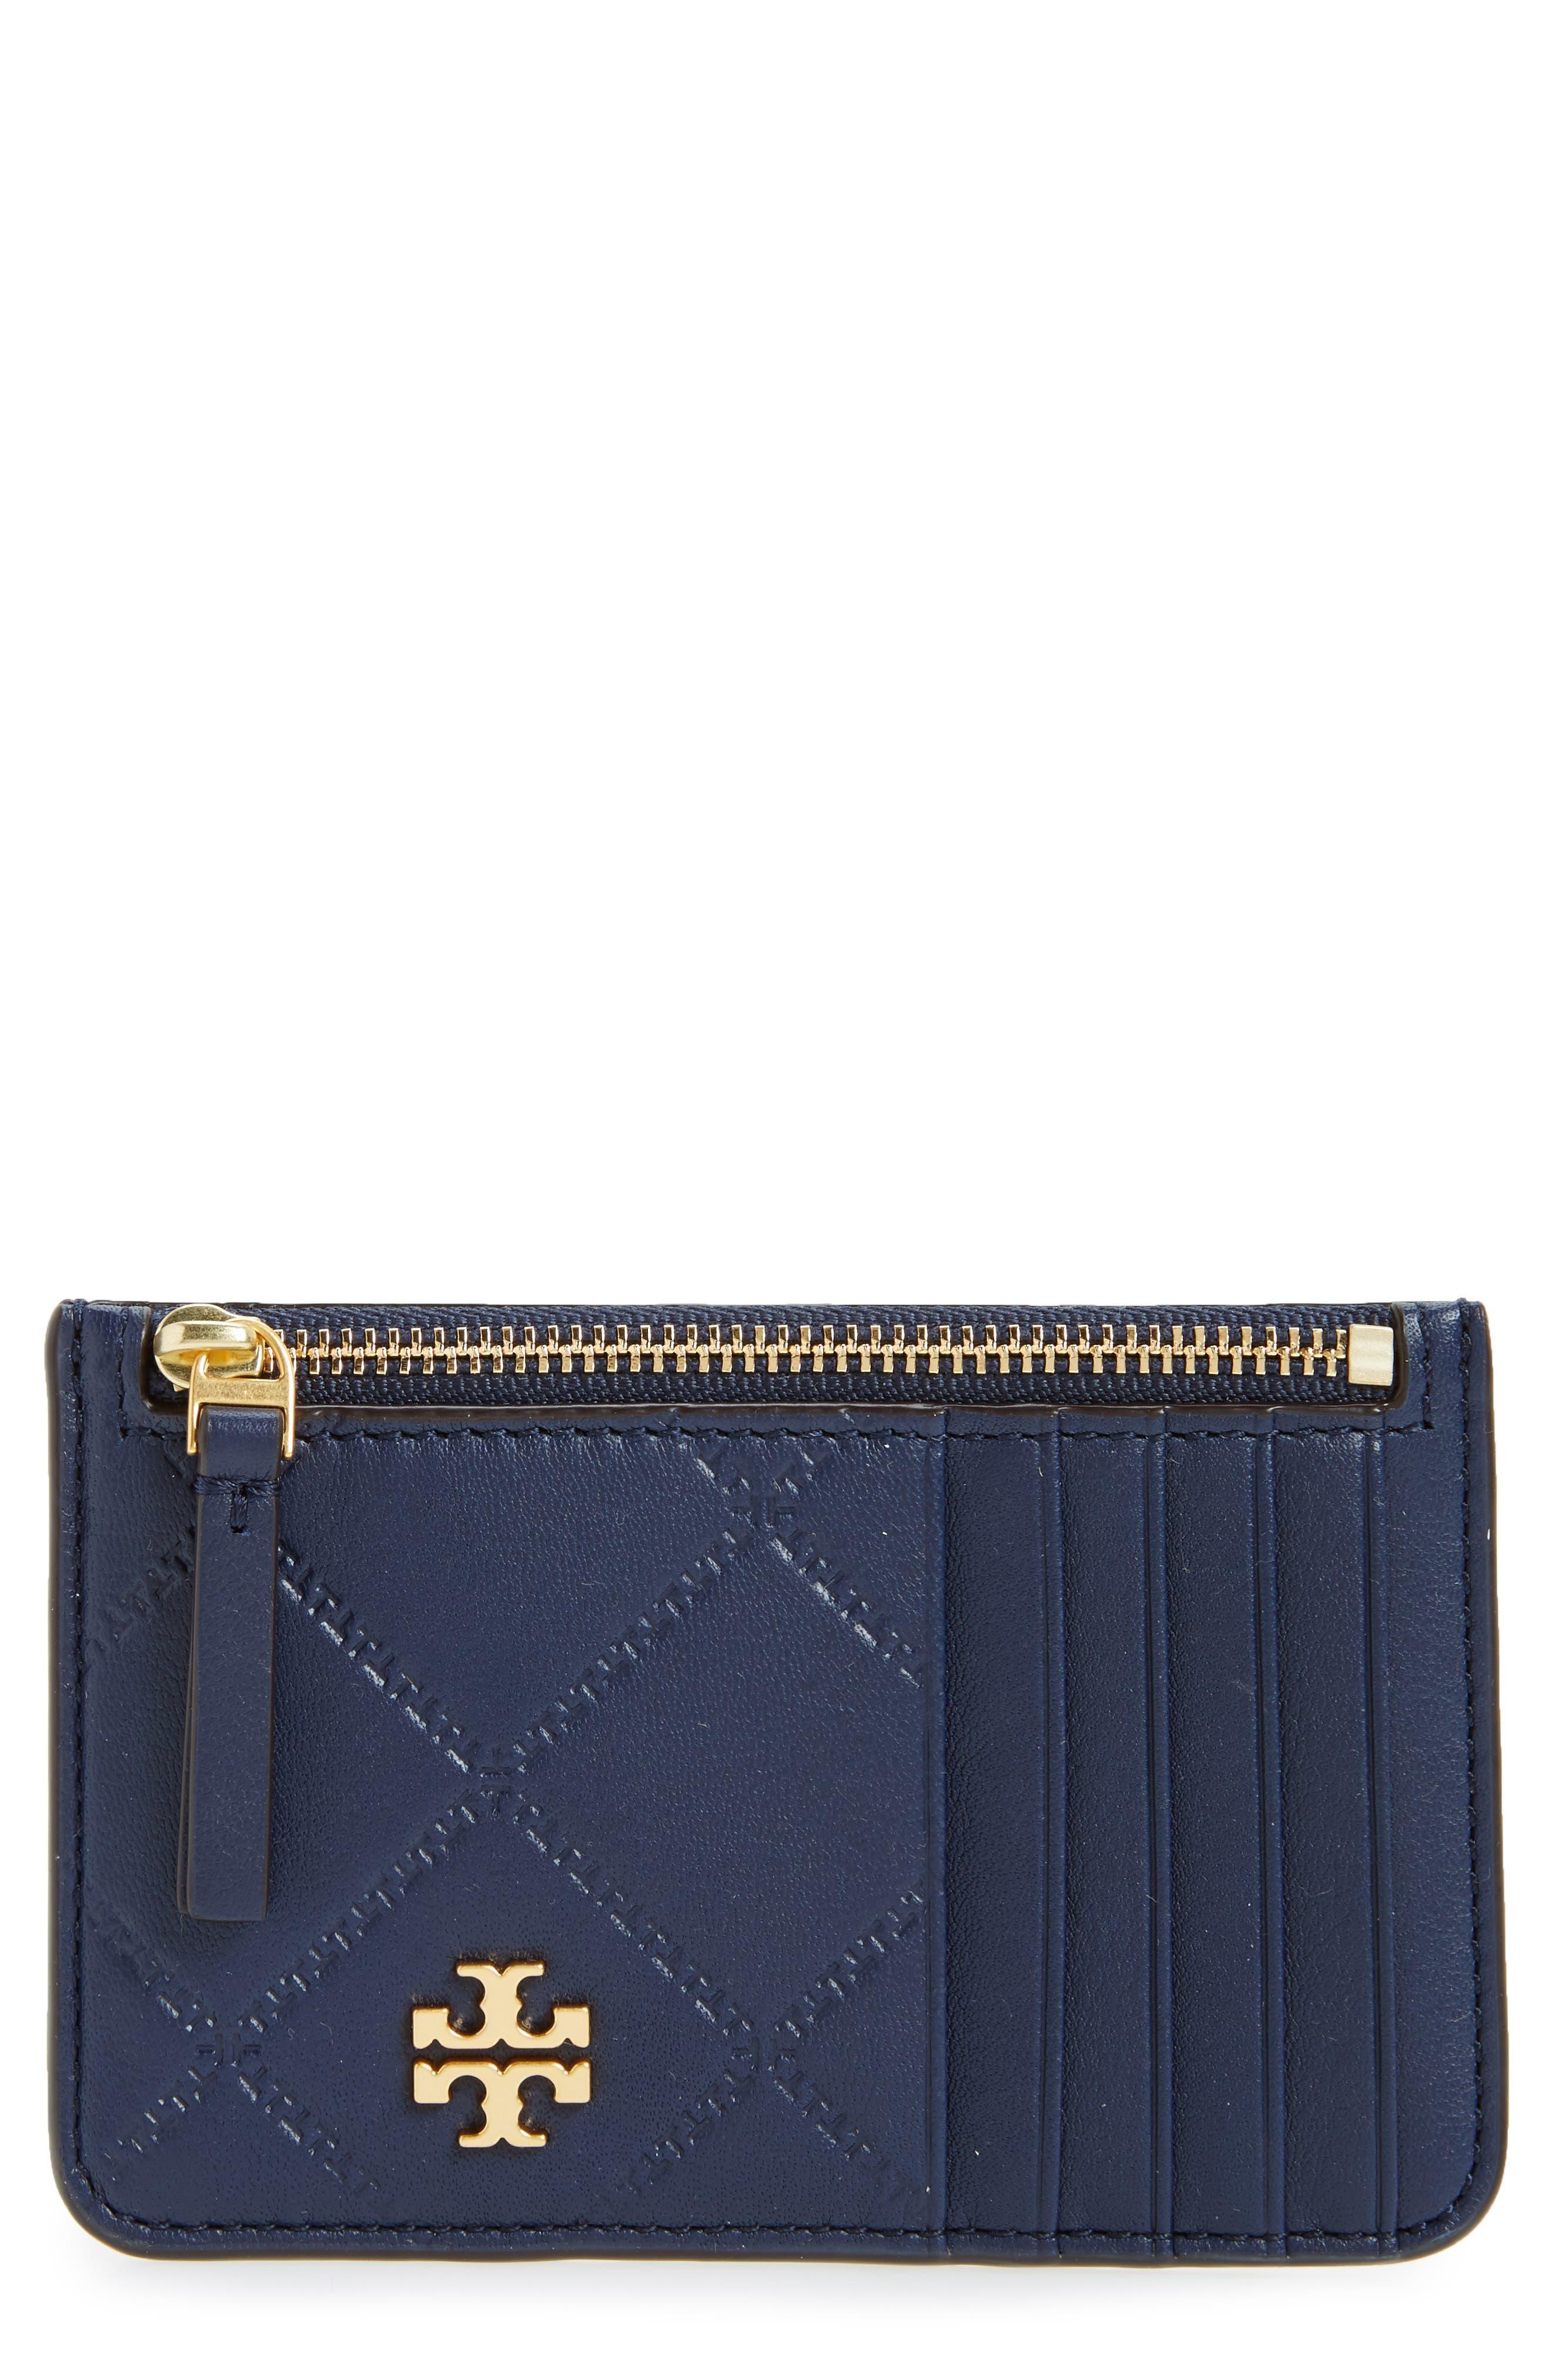 Georgia Leather Card Case,                         Main,                         color, Royal Navy